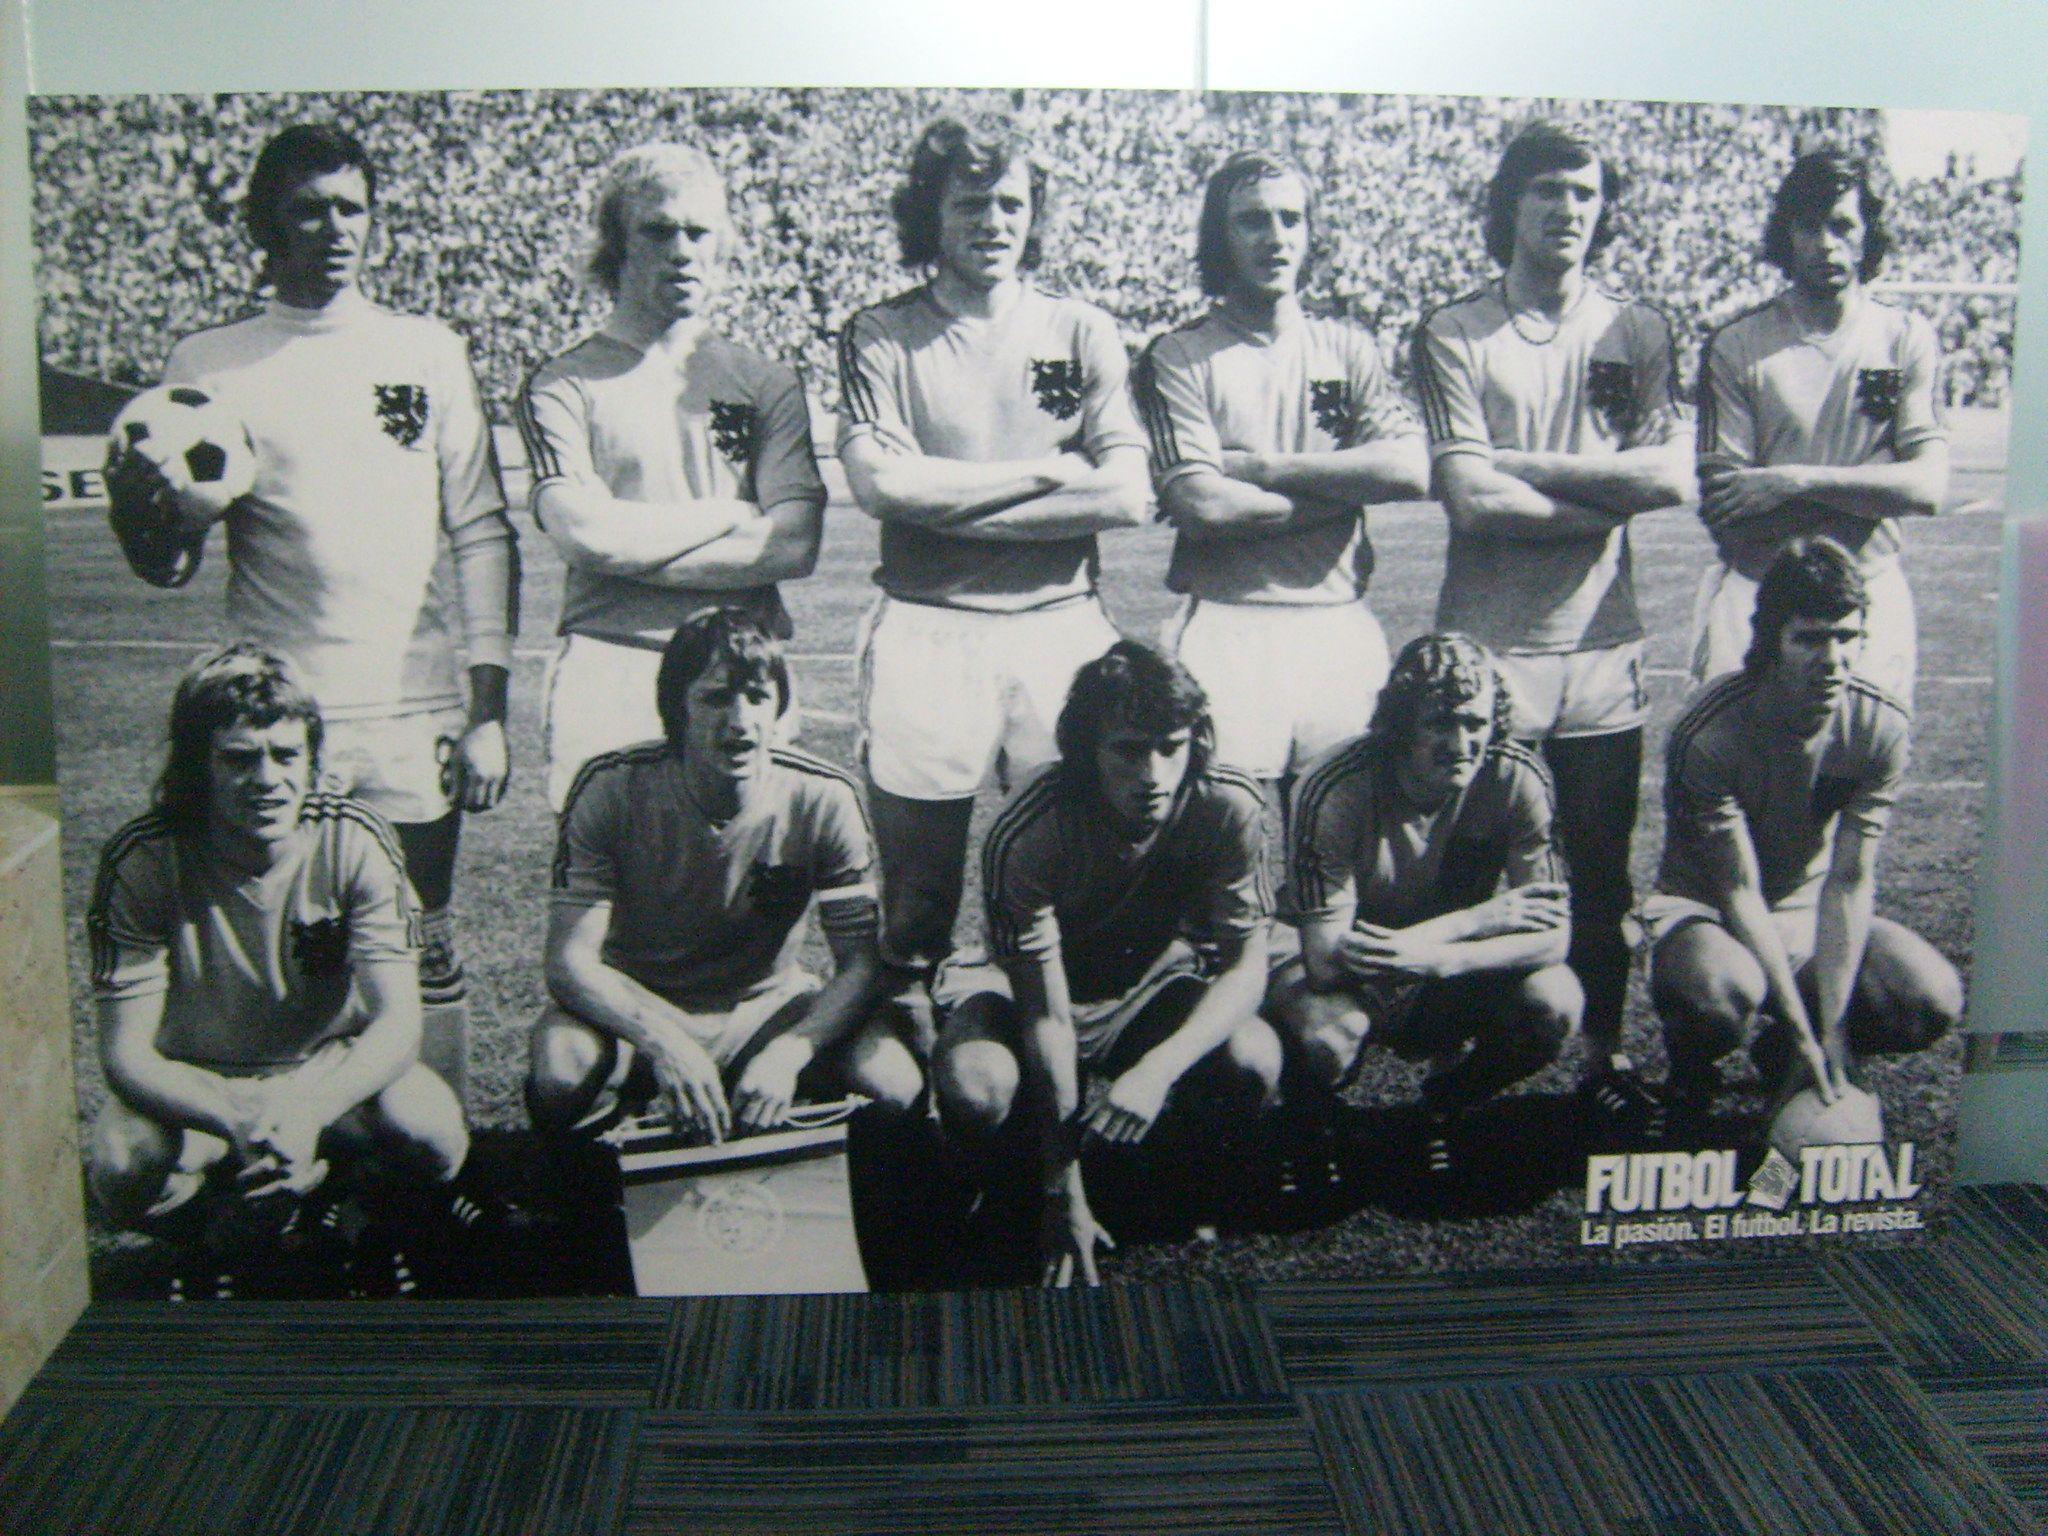 Holanda de 1974. #Cruyff #Holanda